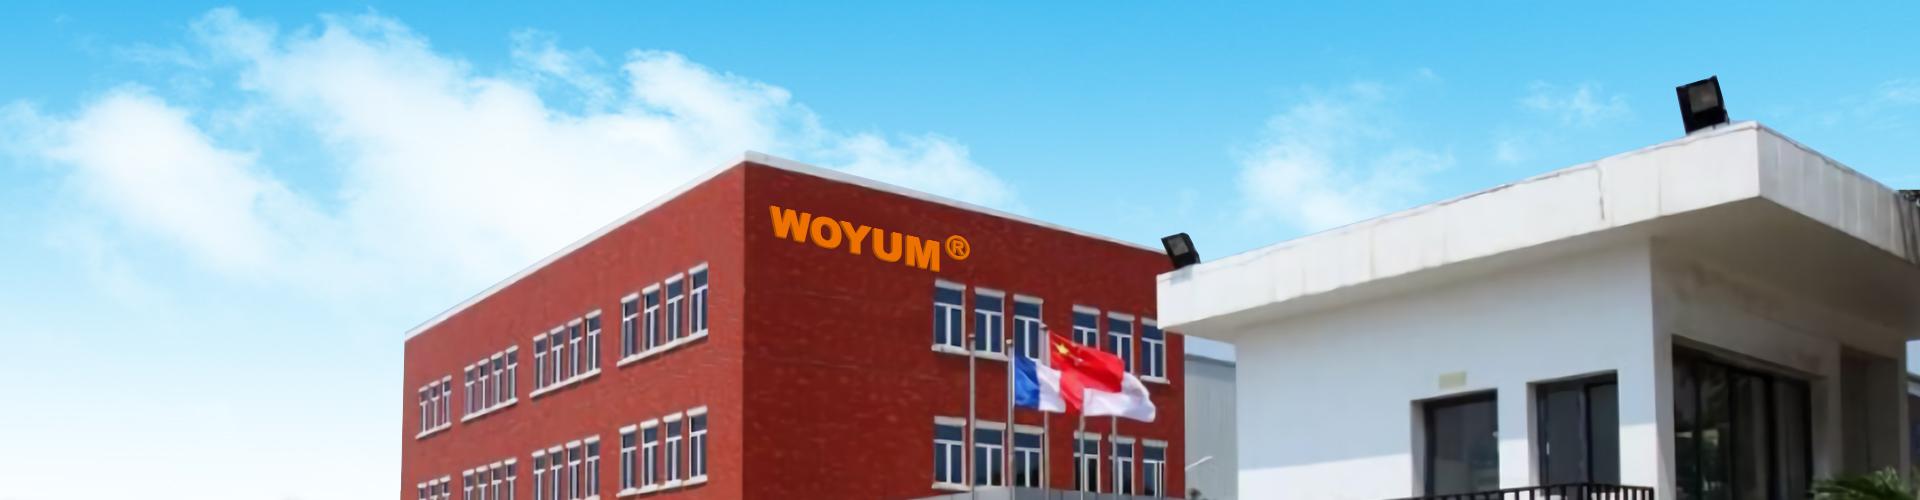 High-quality Manufacturing Of Multi Port Usb Car Charger | Woyum-Woyum